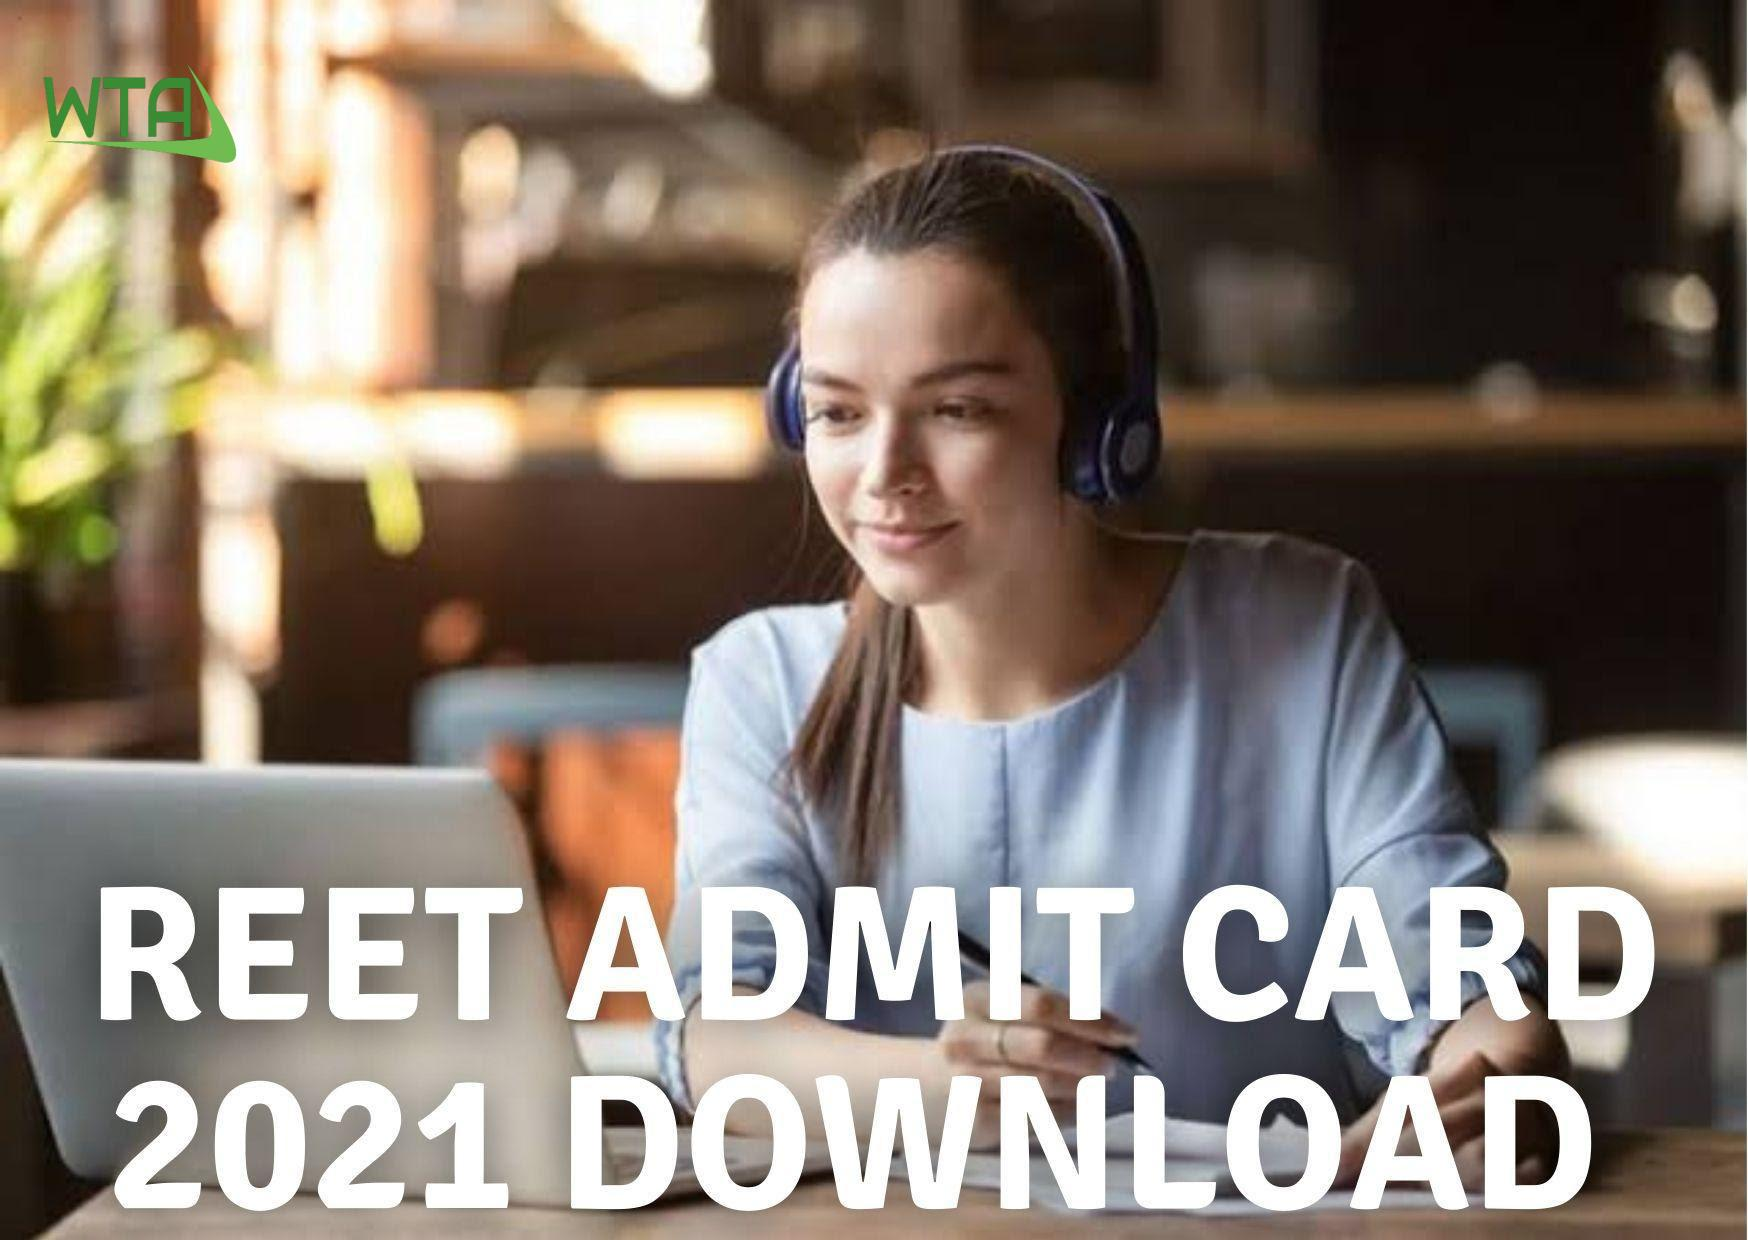 Reet admit card 2021 download